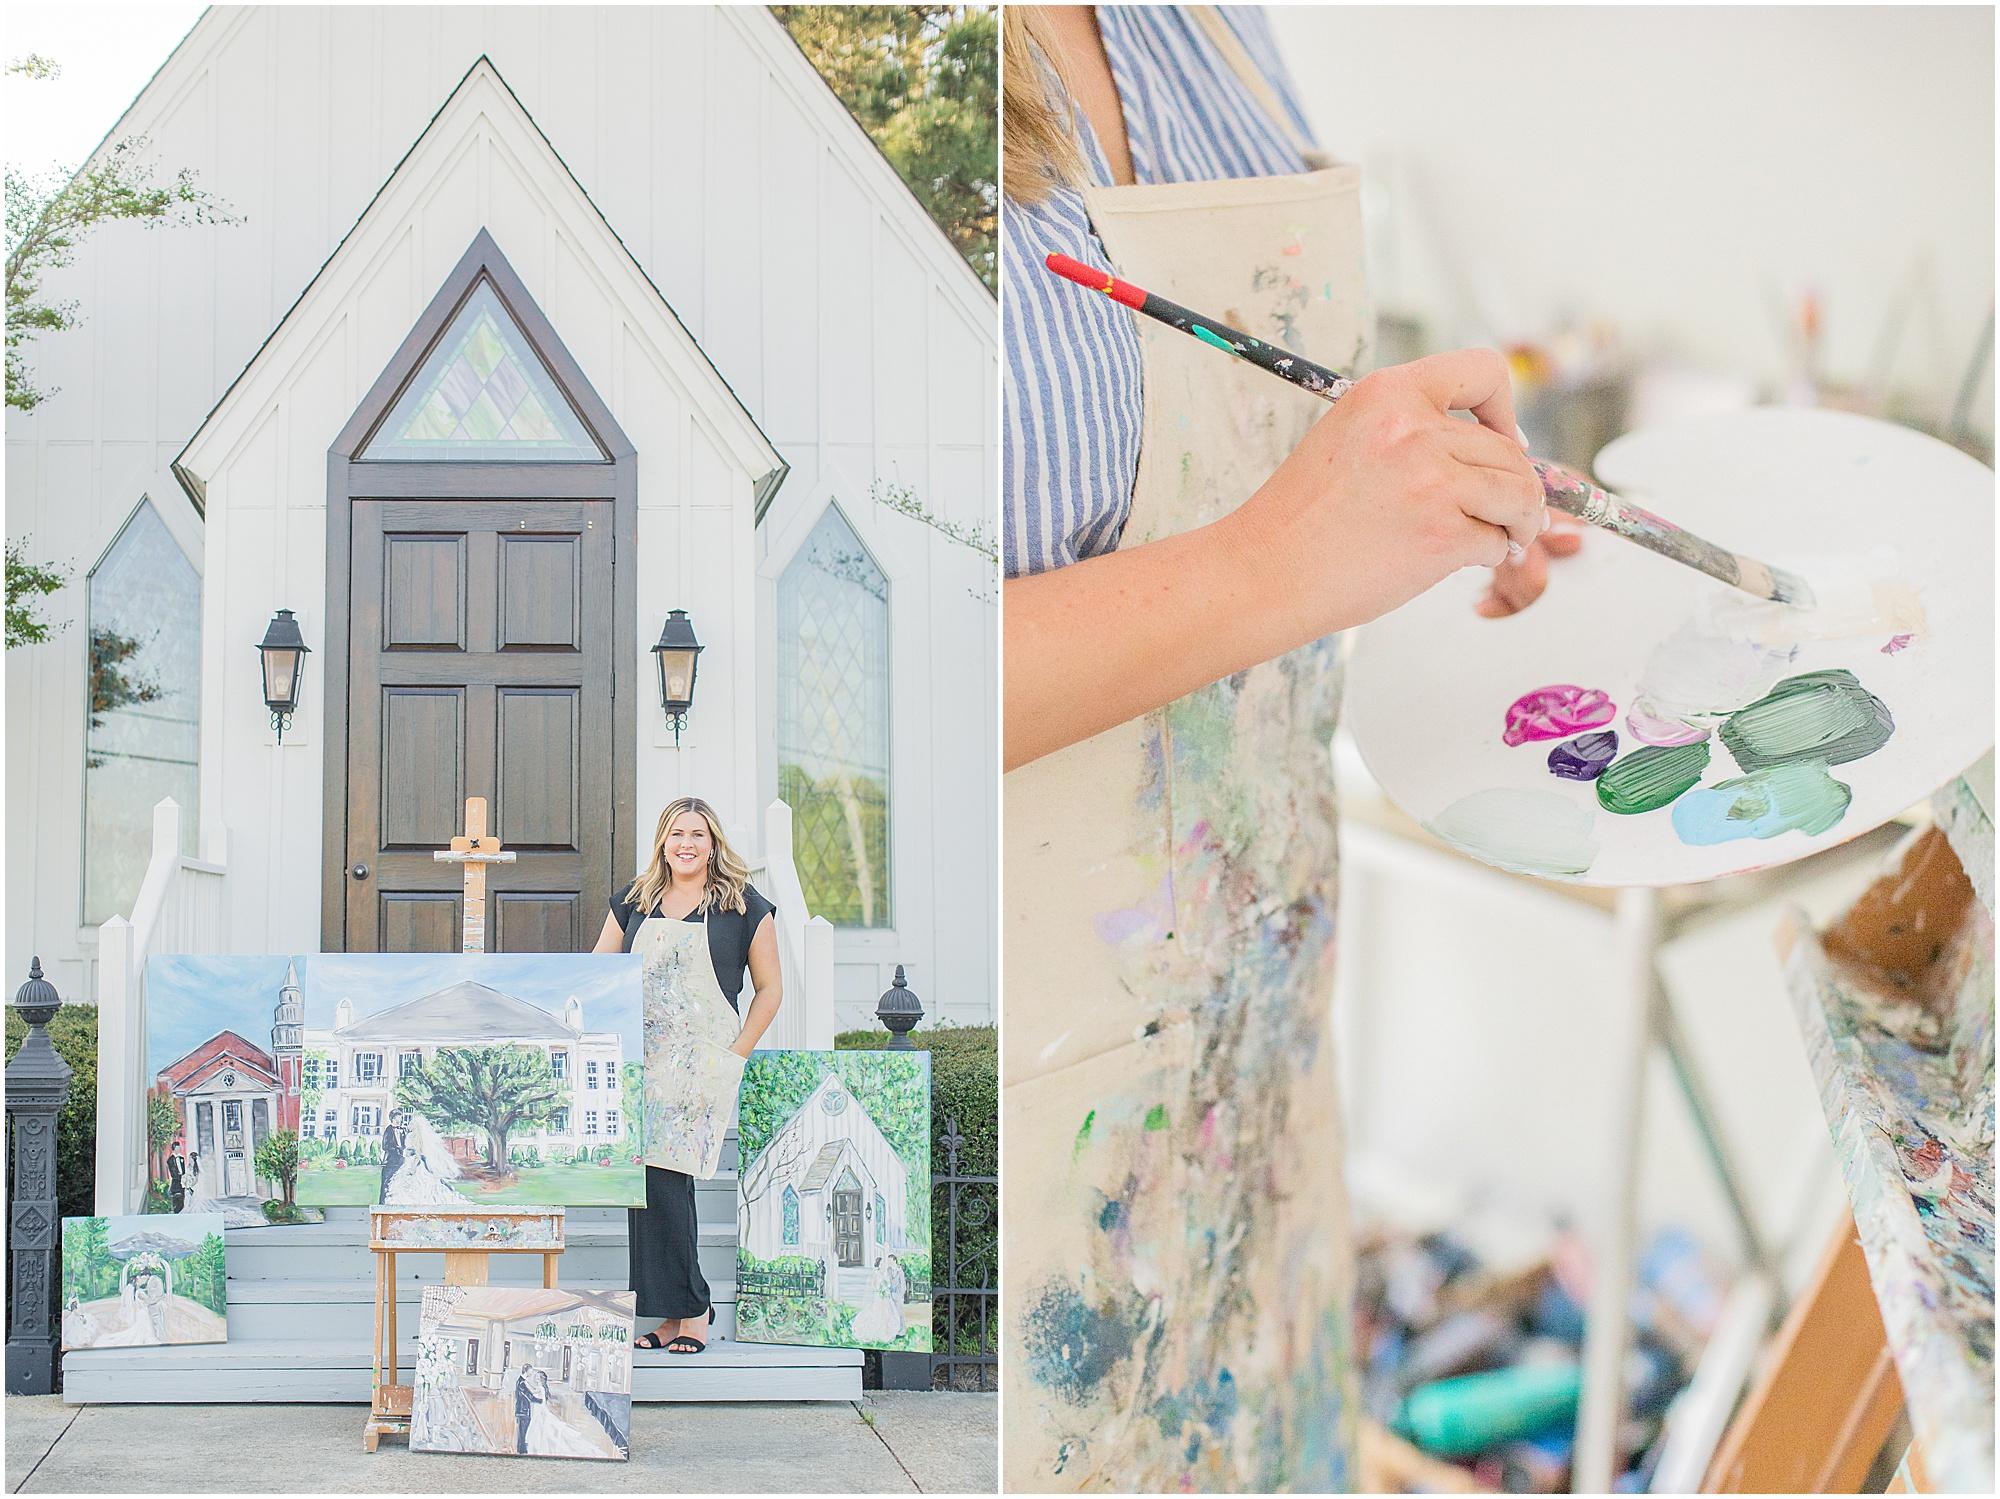 miriam-shufelt-art-mississippi-live-wedding-painter_0020.jpg